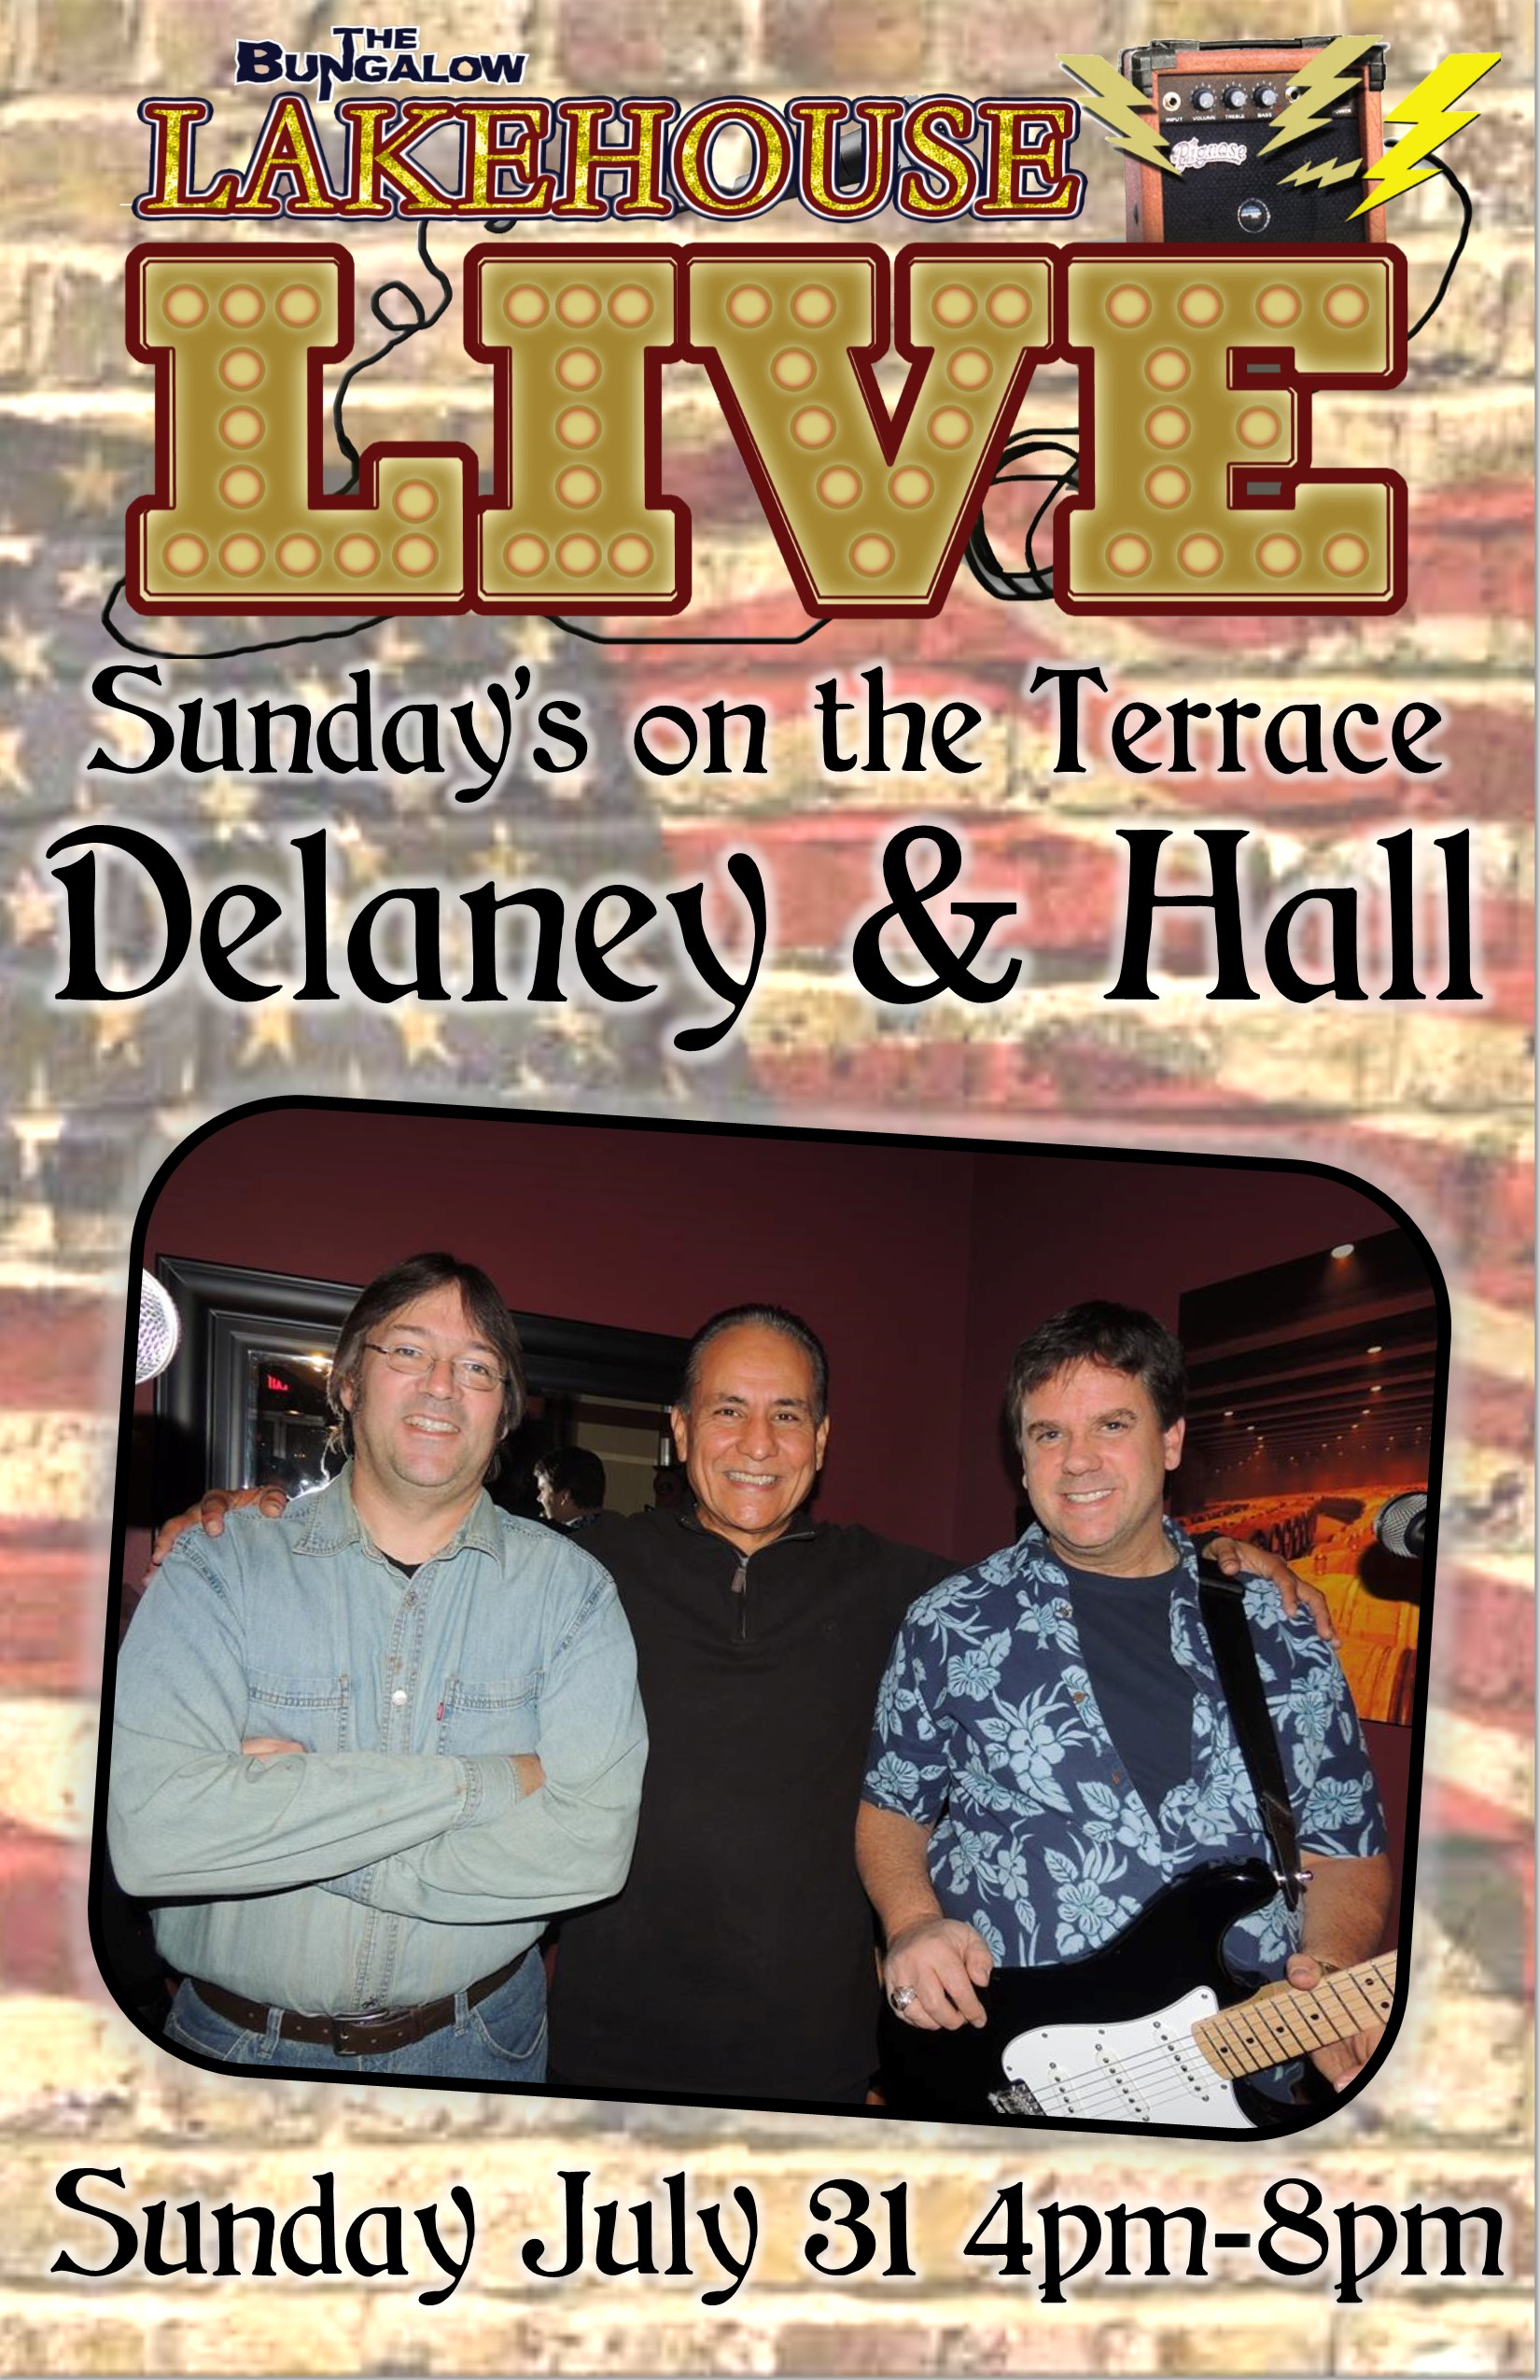 delaney & Hall